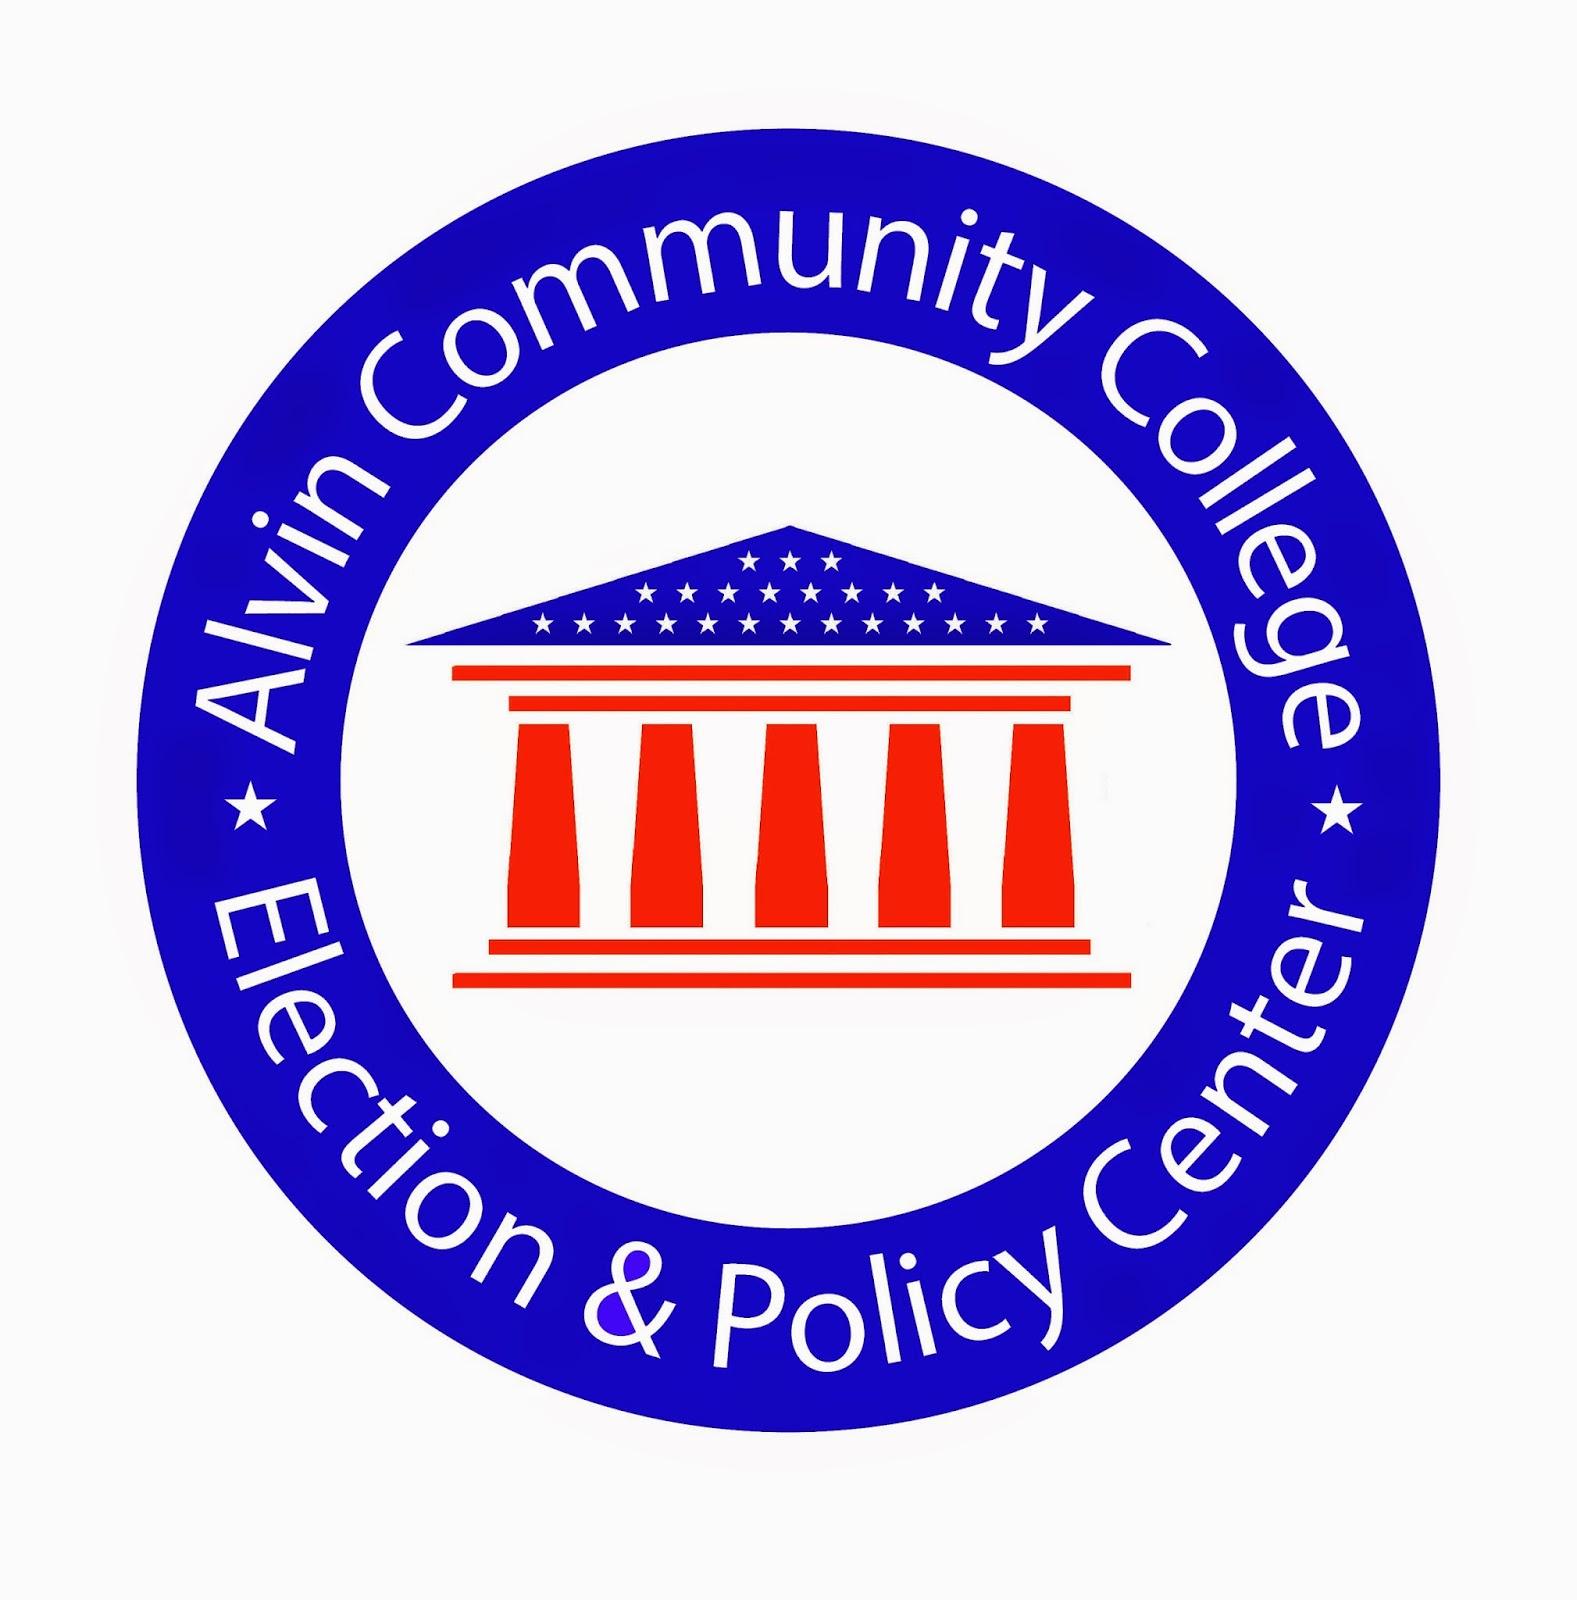 www.electionpolicycenter.org